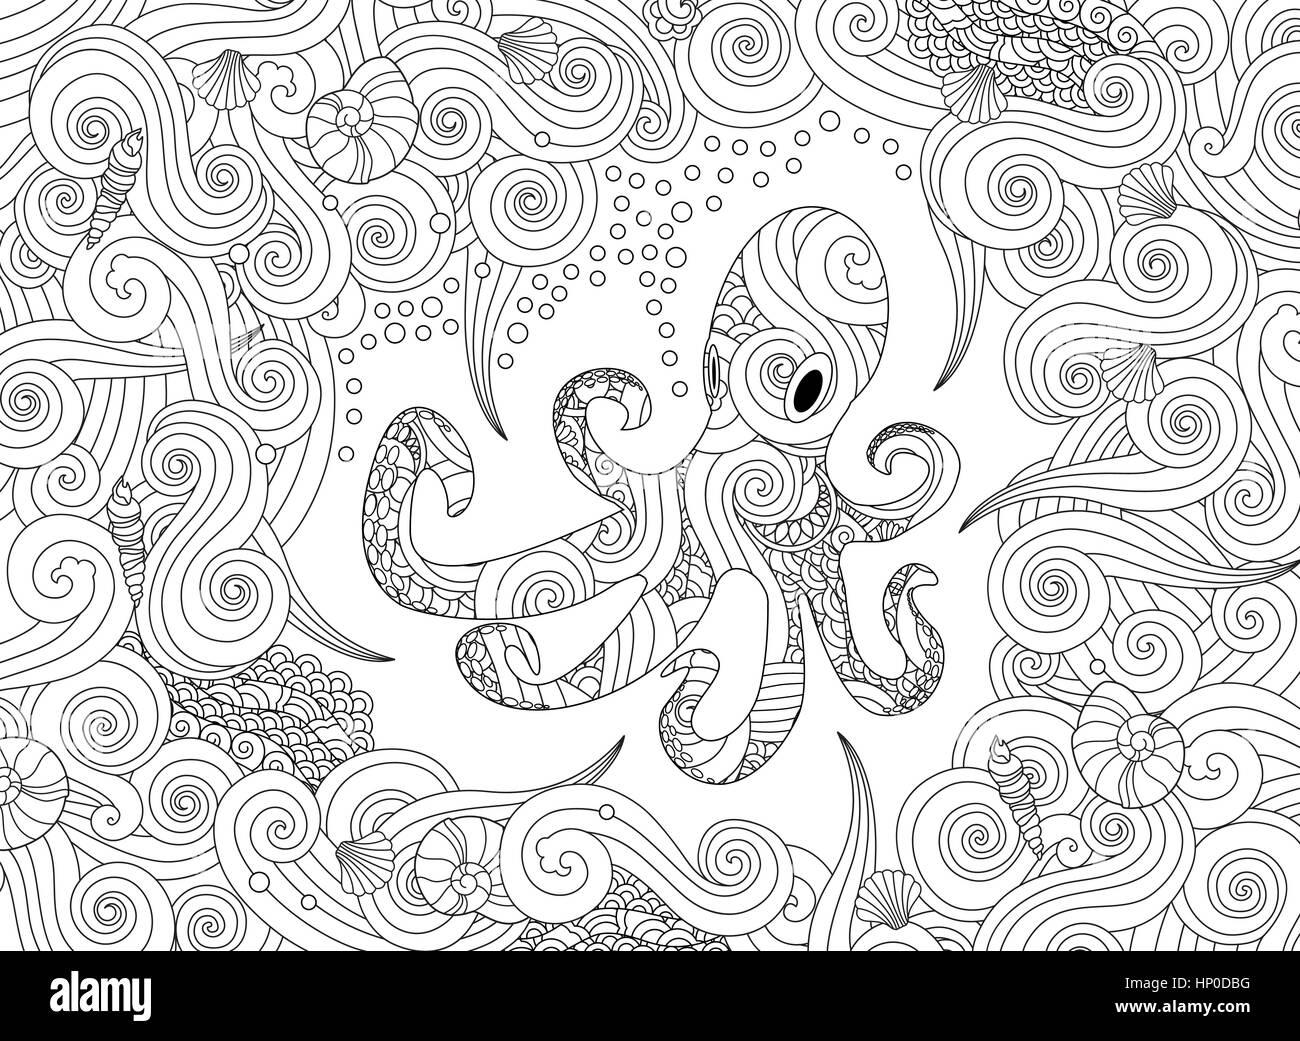 Animal Book Illustration Stockfotos & Animal Book Illustration ...